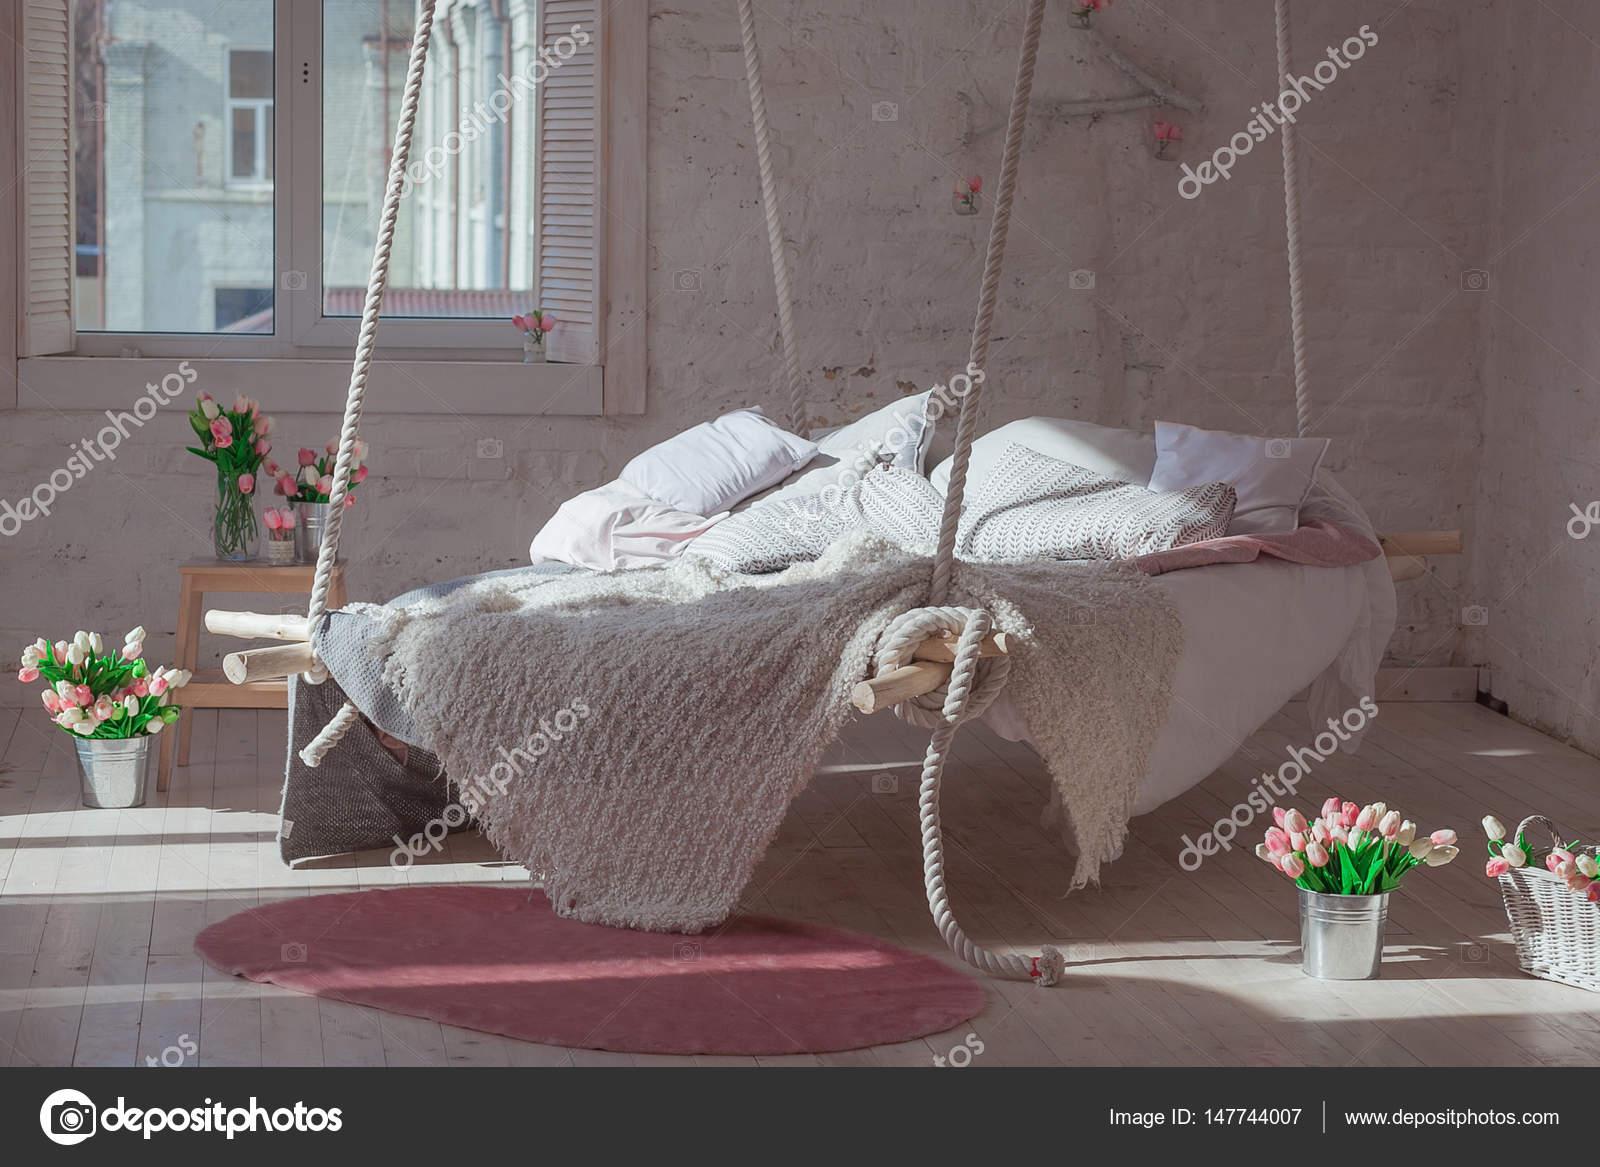 https://st3.depositphotos.com/10131542/14774/i/1600/depositphotos_147744007-stockafbeelding-witte-loft-interieur-in-klassieke.jpg